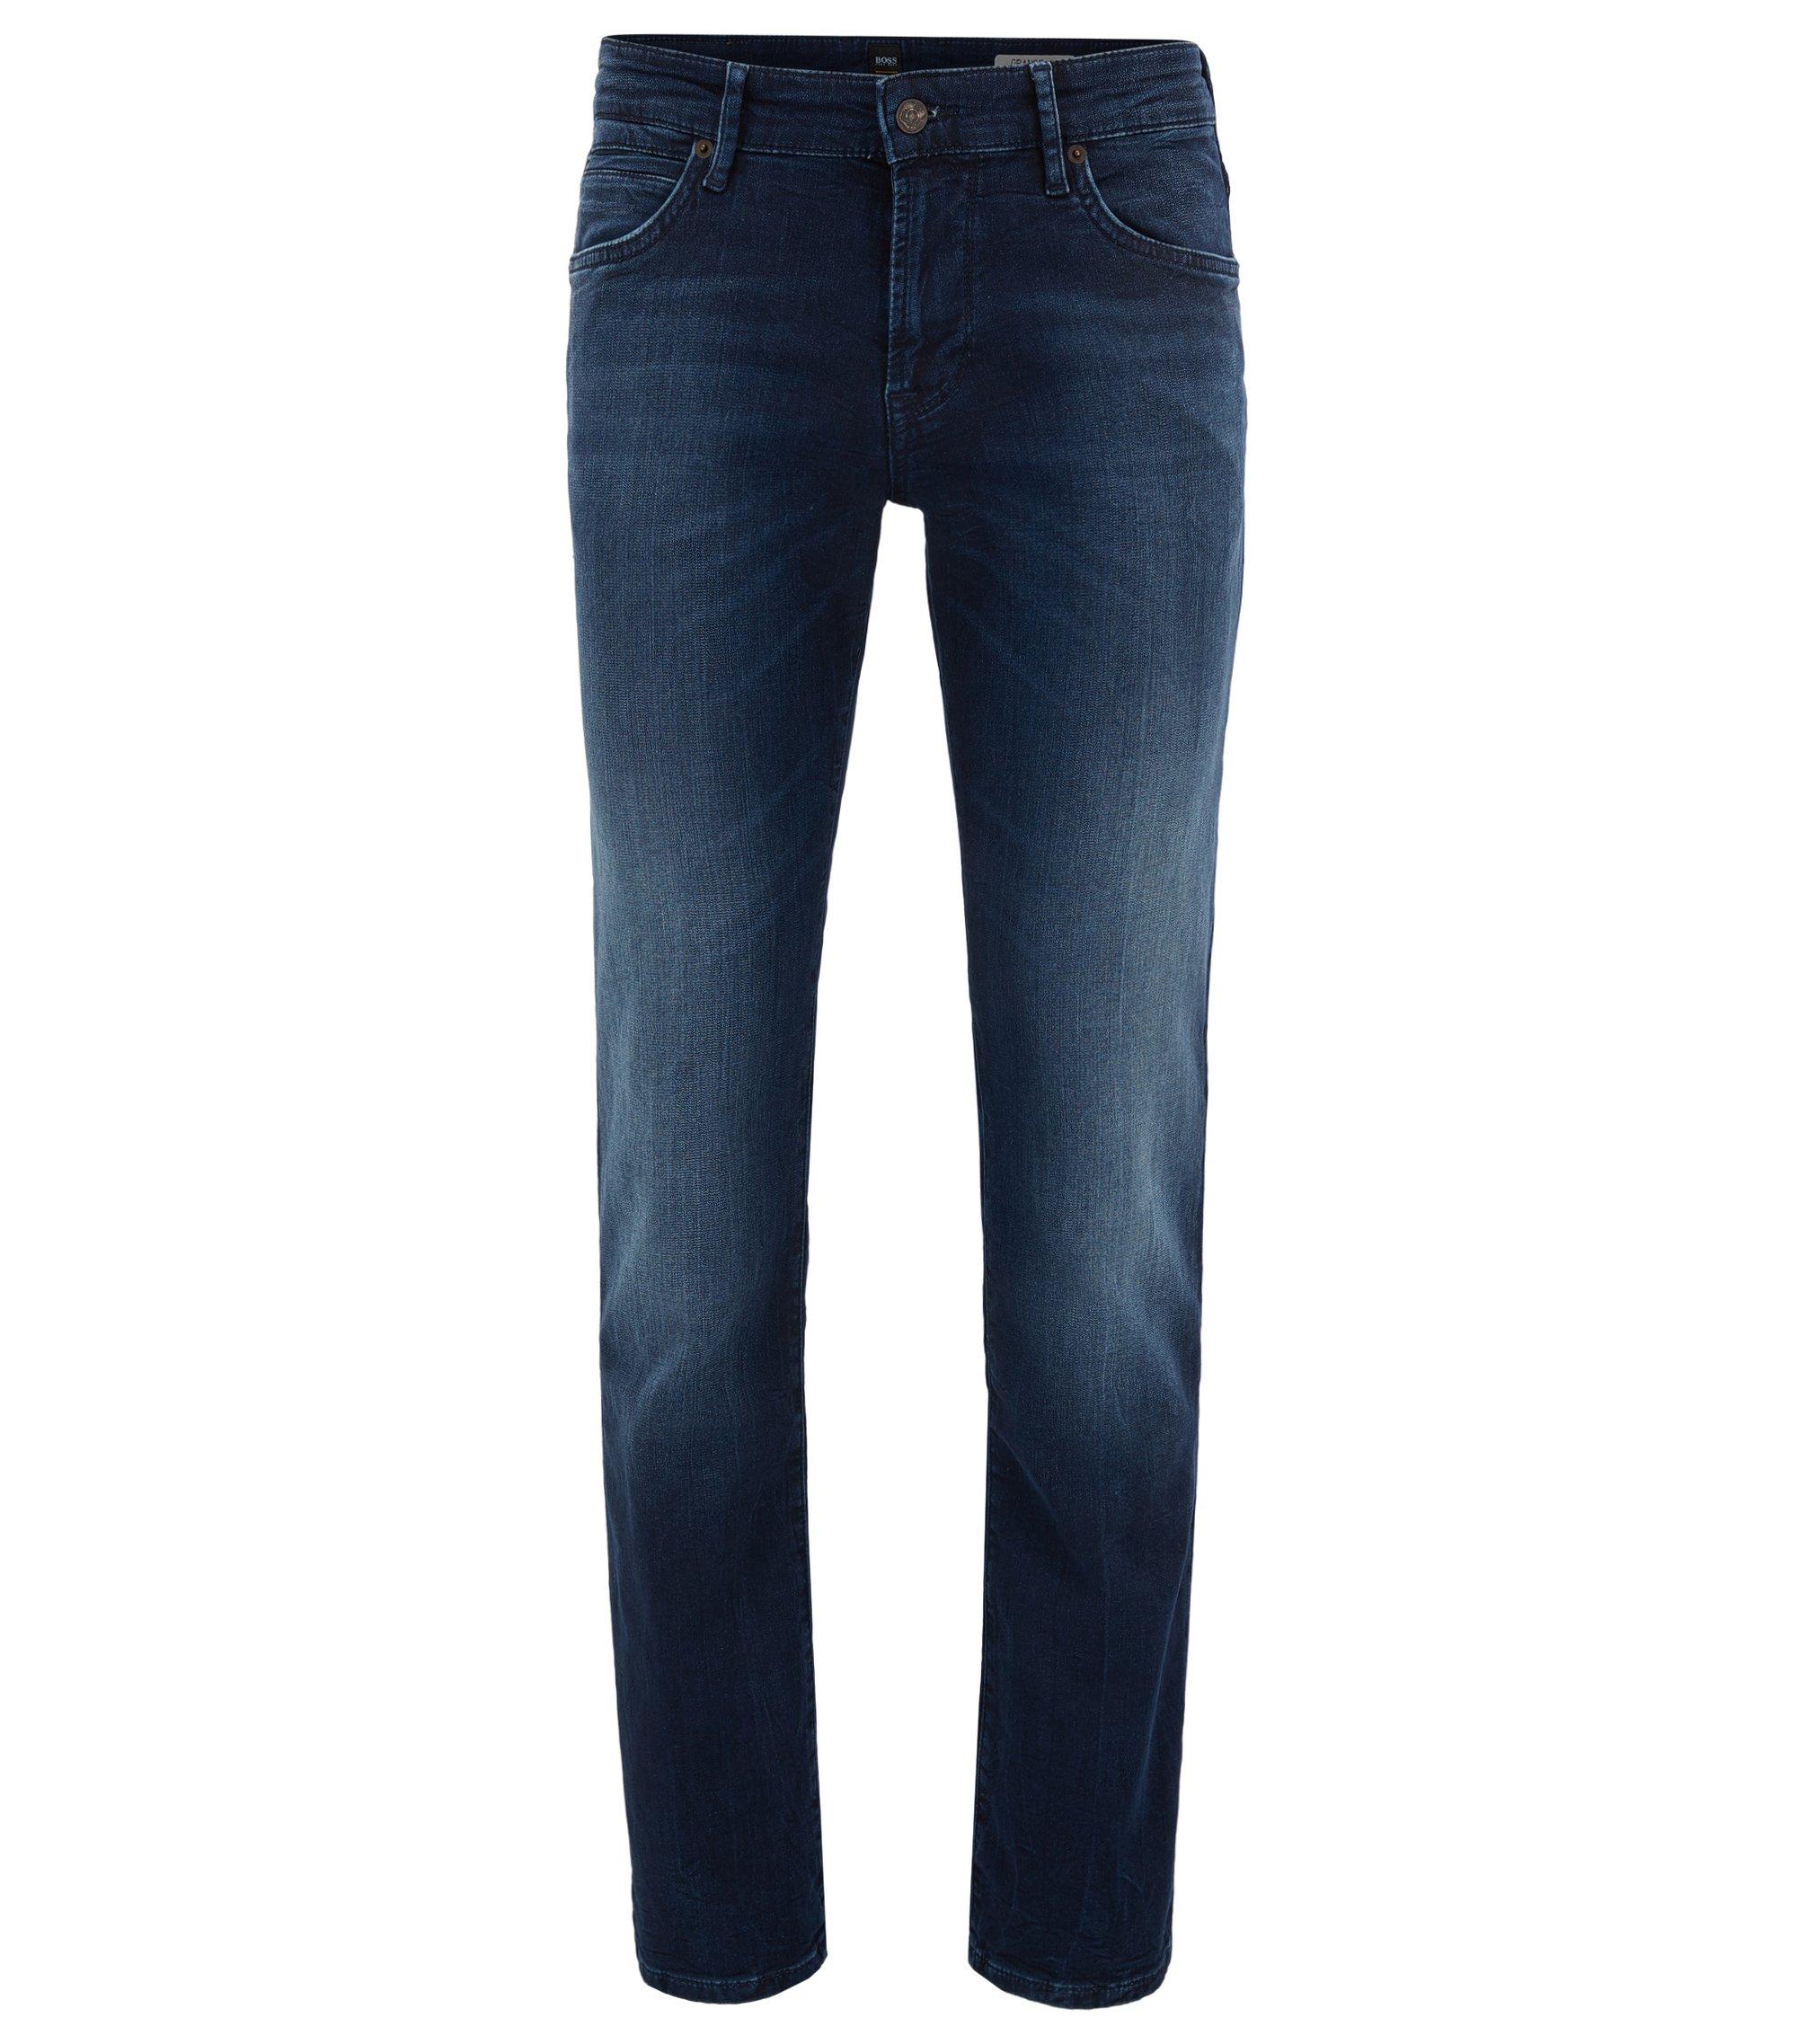 Jeans regular fit in denim elasticizzato in maglia, Blu scuro